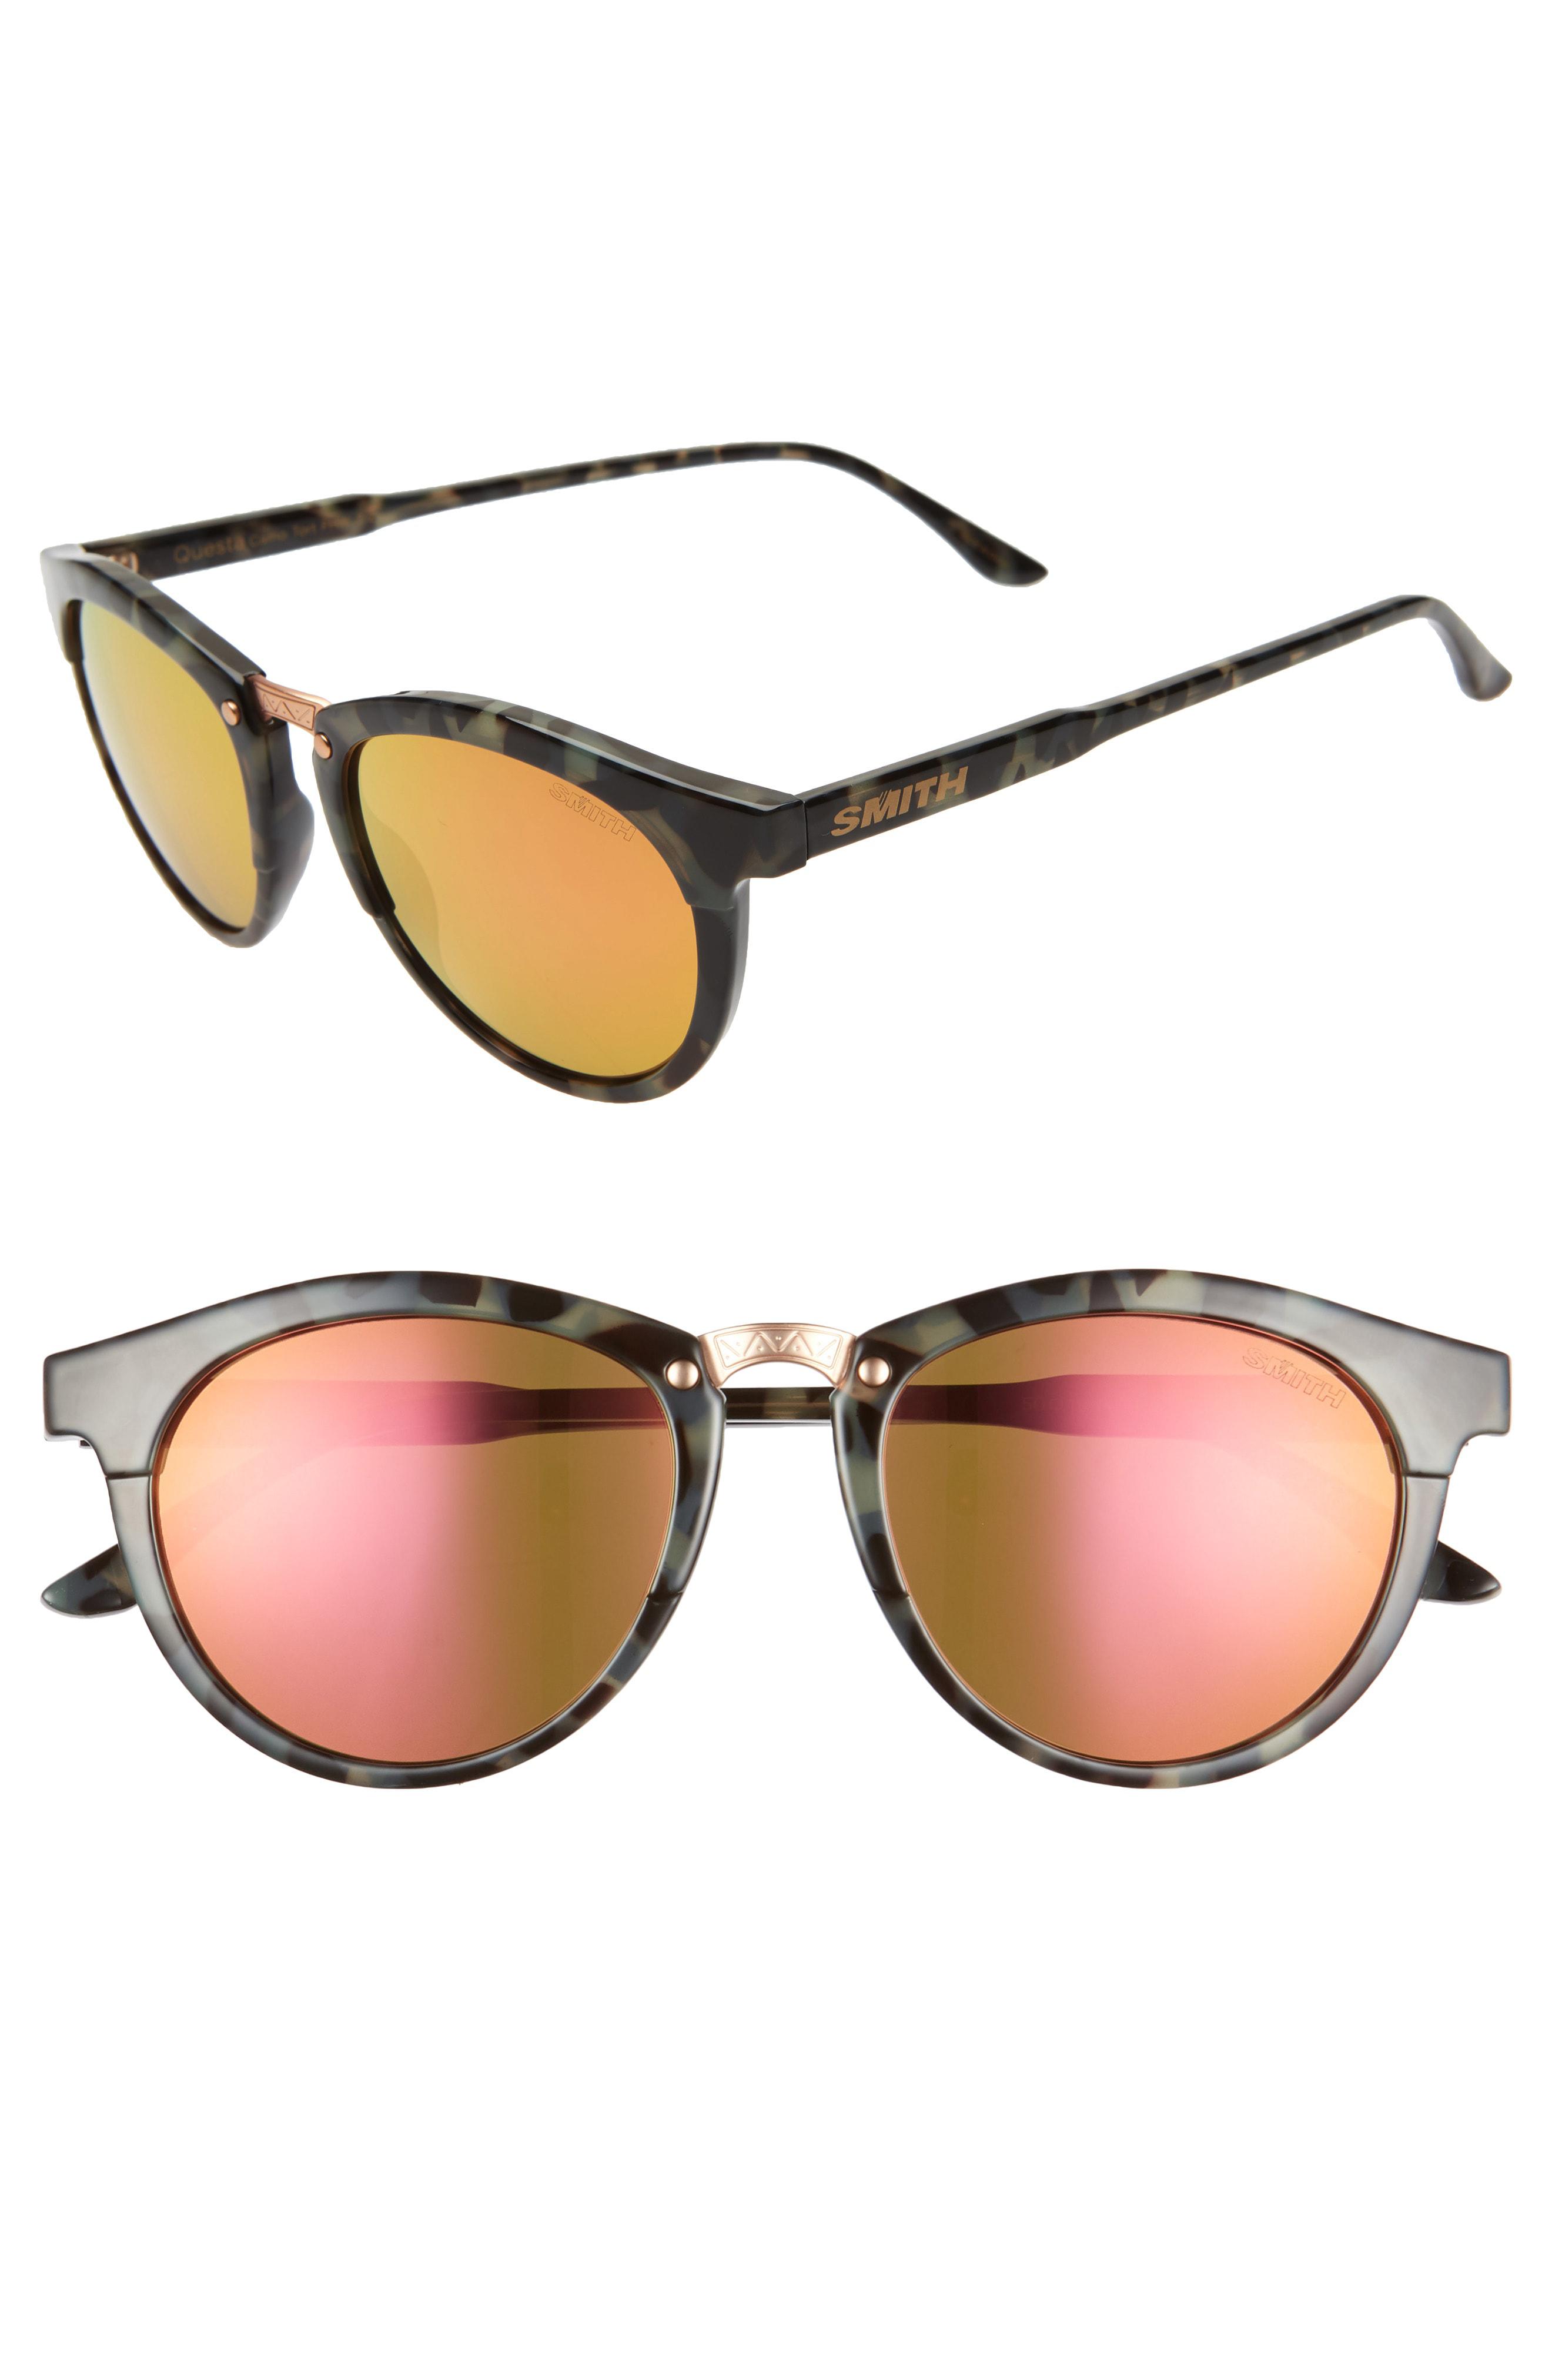 1fcde8a58 Smith Questa 49Mm Chromapop Polarized Sunglasses - Camo Tortoise/ Pink